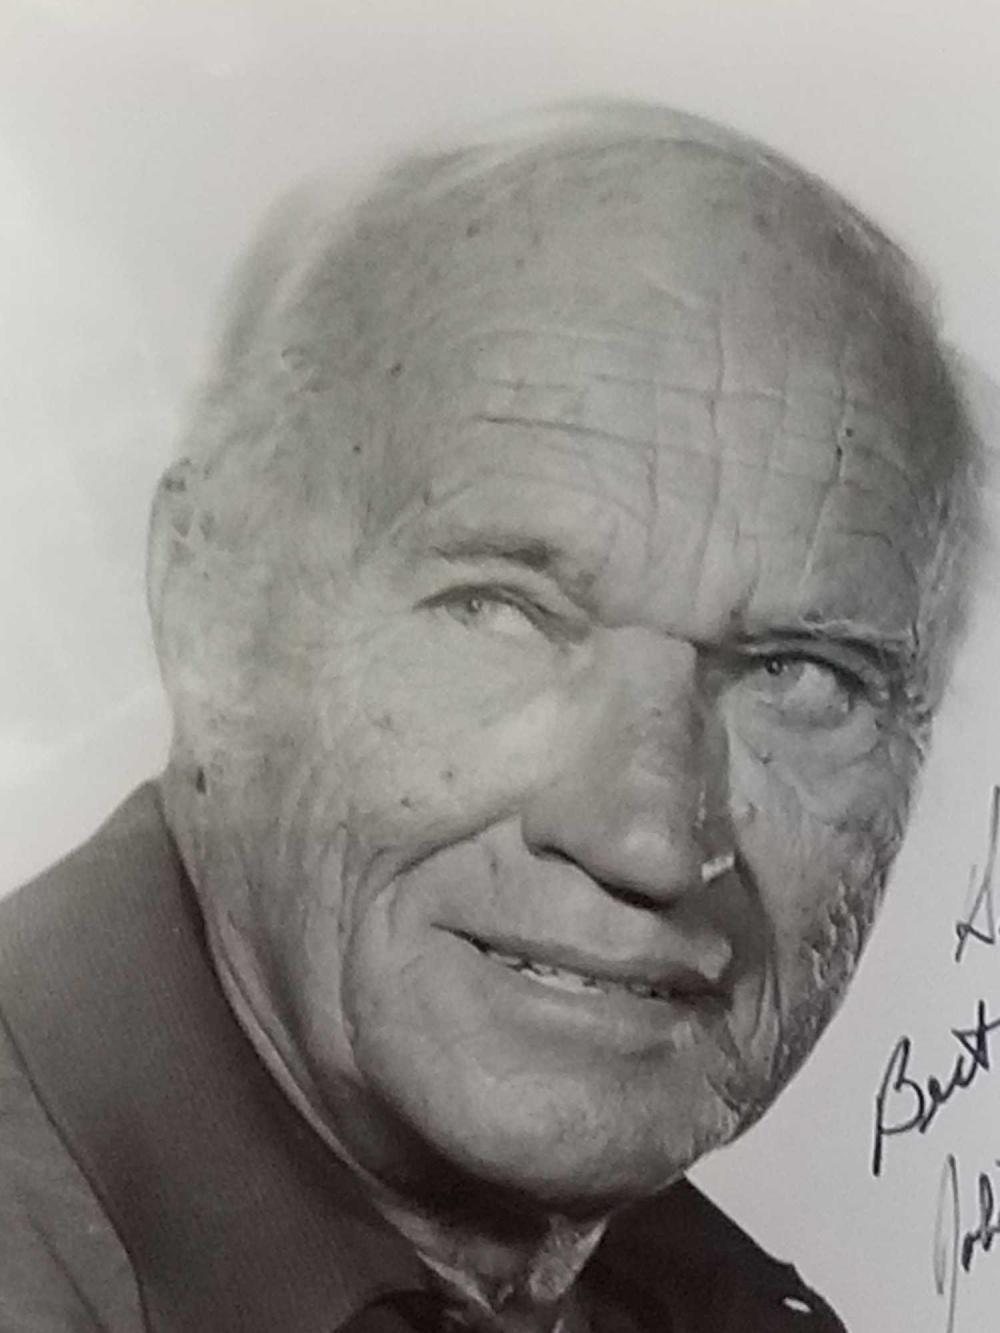 Lot 43: ROBERT J. WILKE HEAD SHOT BLACK & WHITE SIGNED PHOTO